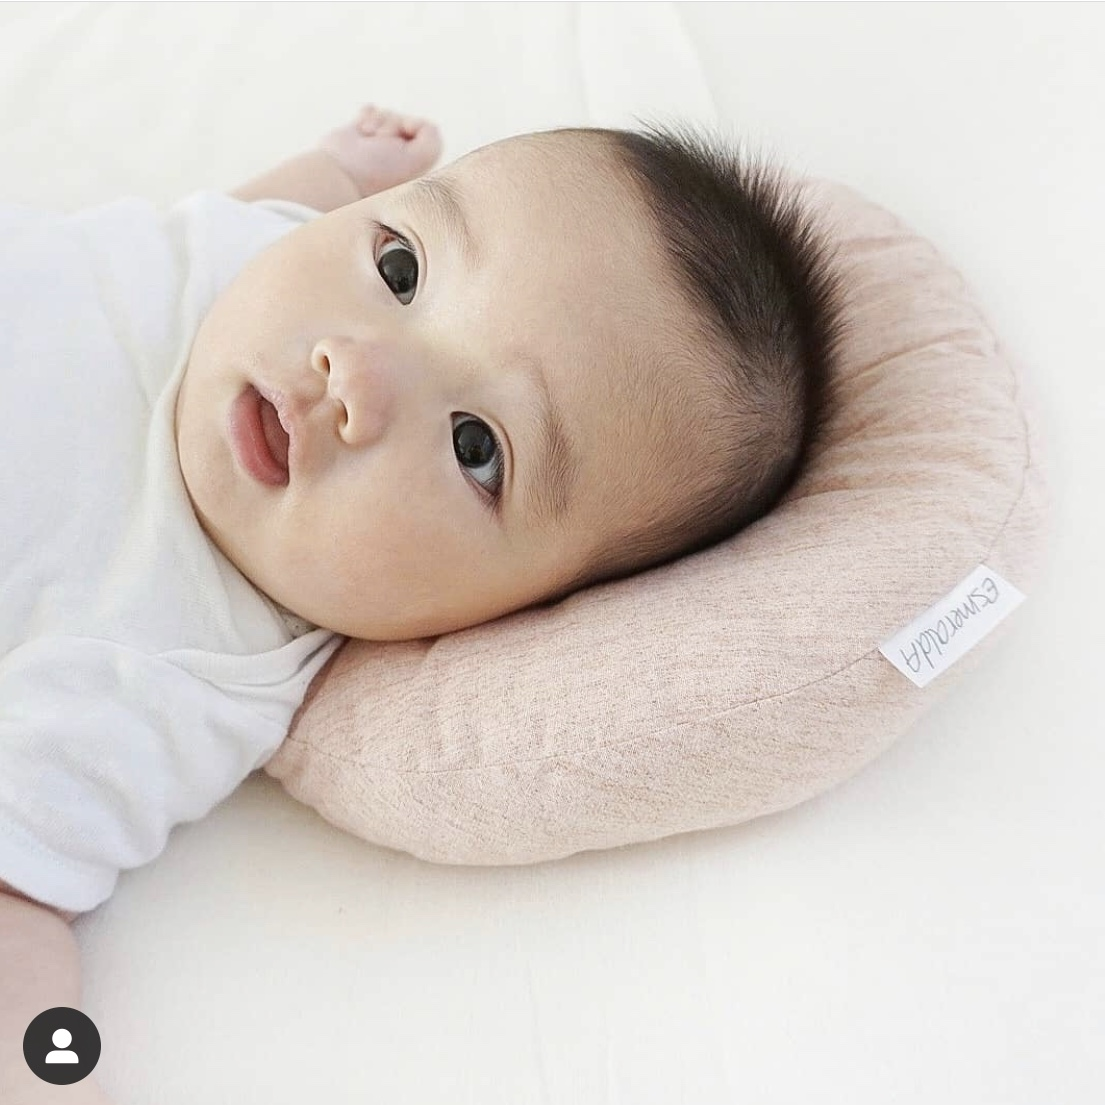 f:id:baby-alice:20201124162704j:plain